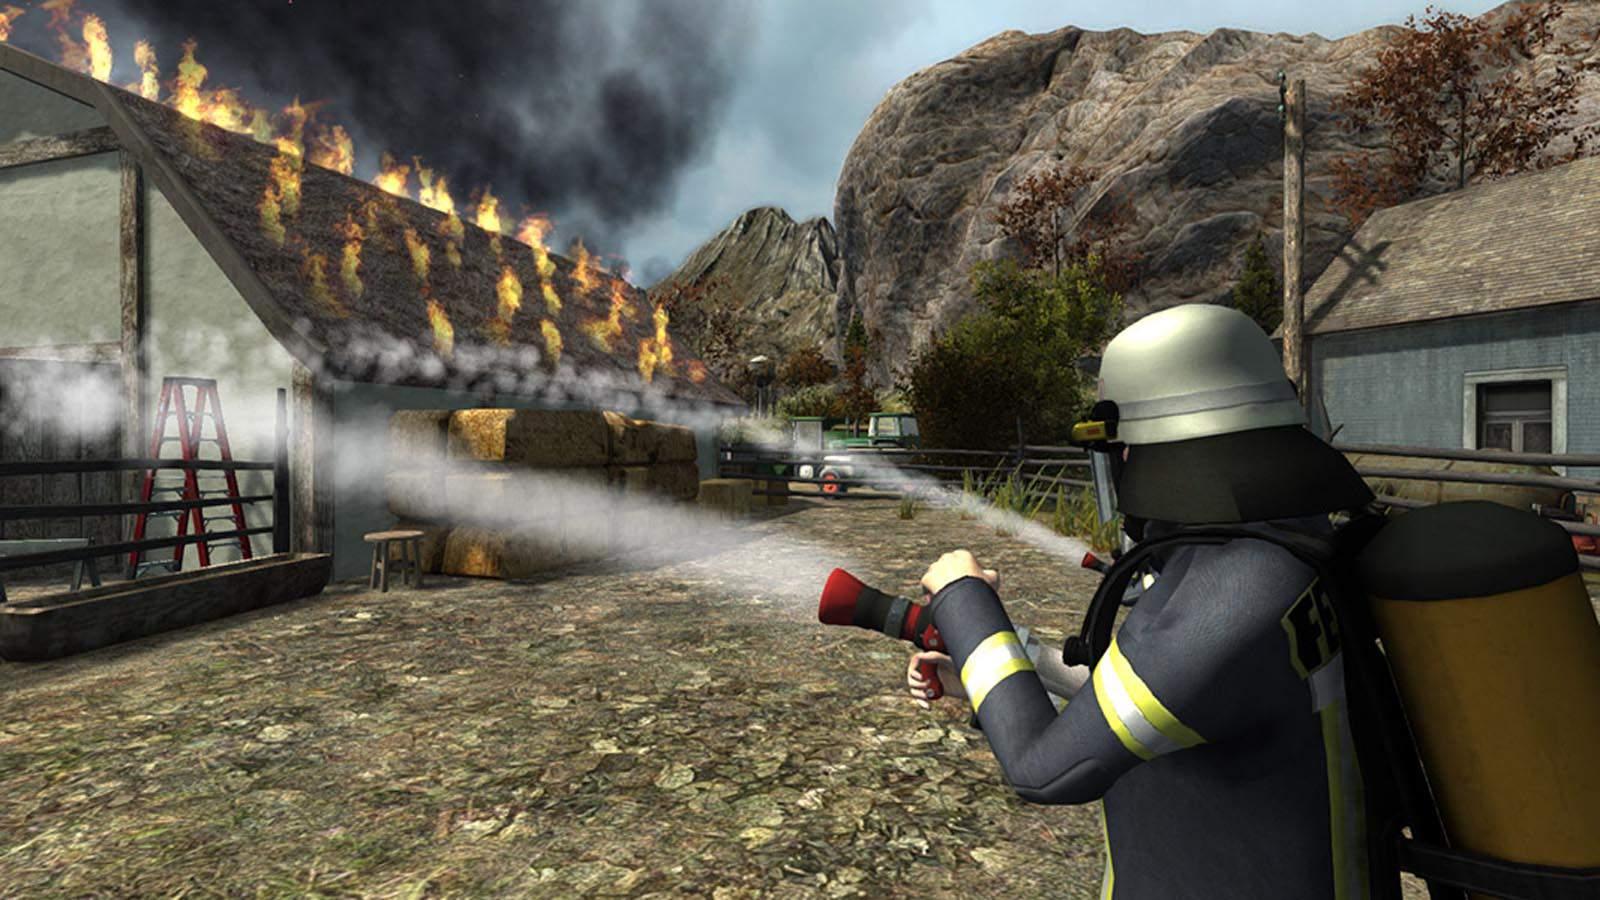 تحميل لعبة Firefighters 2014 برابط مباشر + تورنت